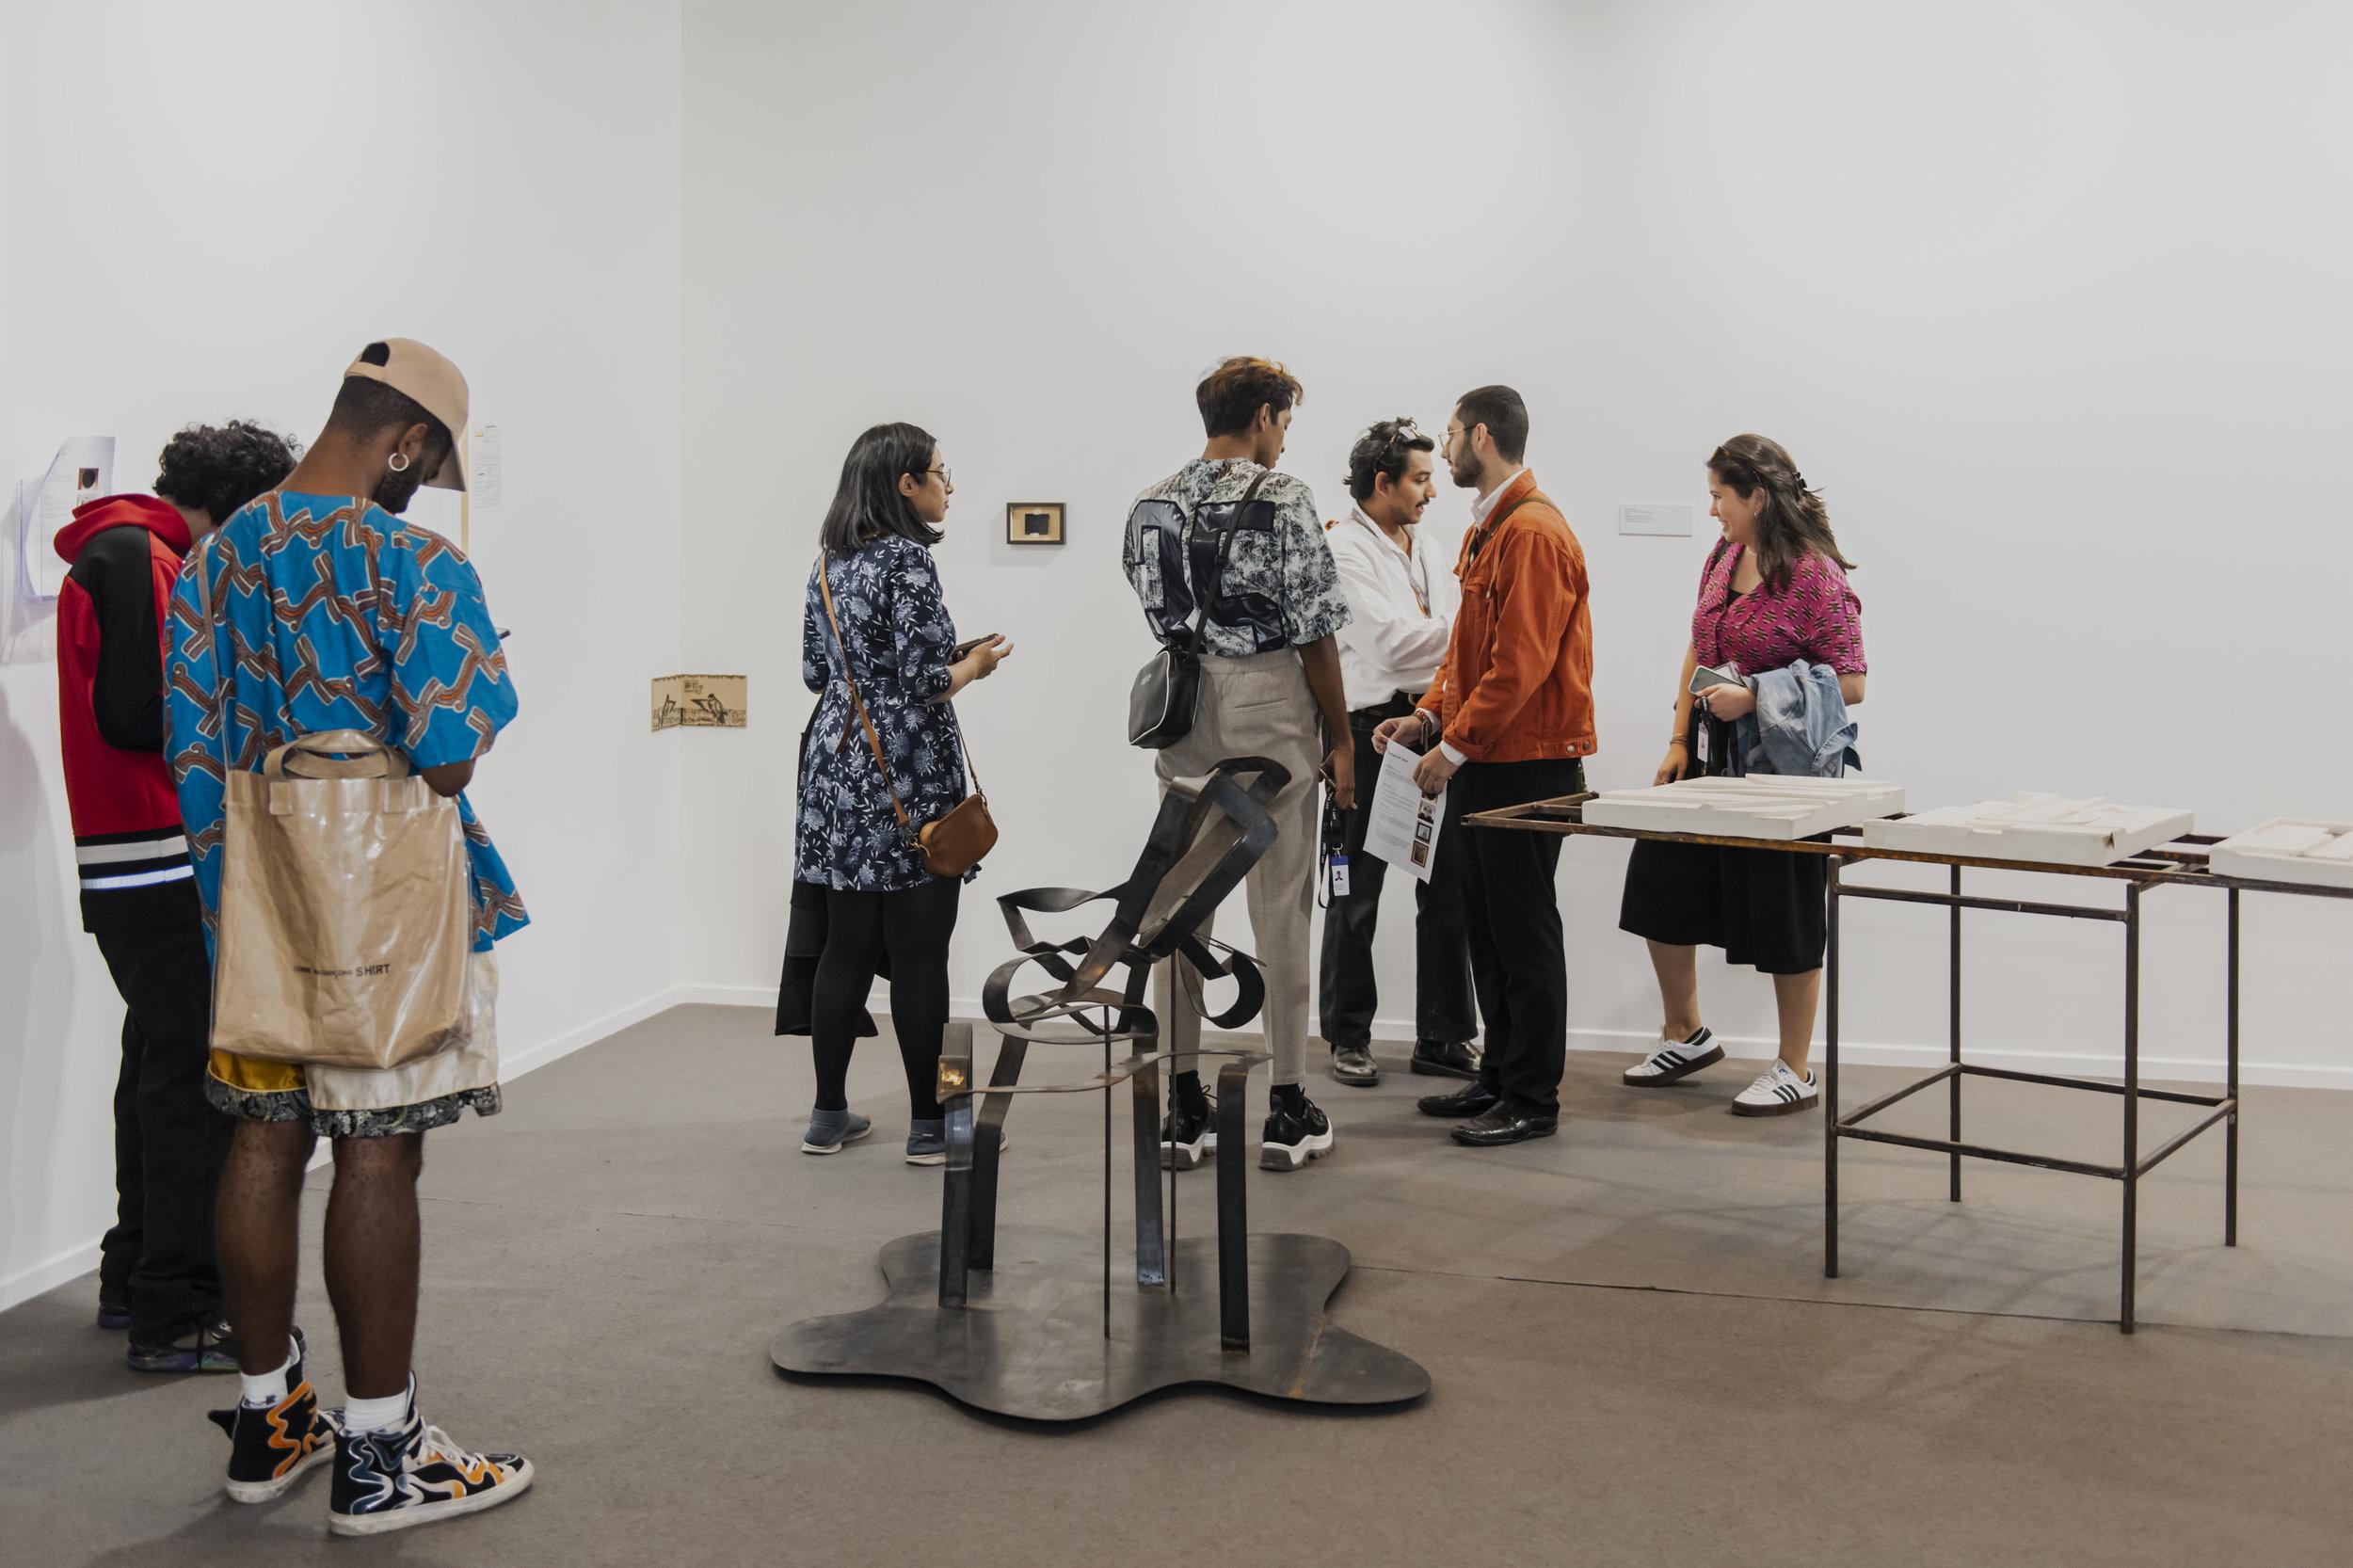 Campus Art Dubai Group Show, Art Dubai 2019, Courtesy of Photo Solutions (4).jpg